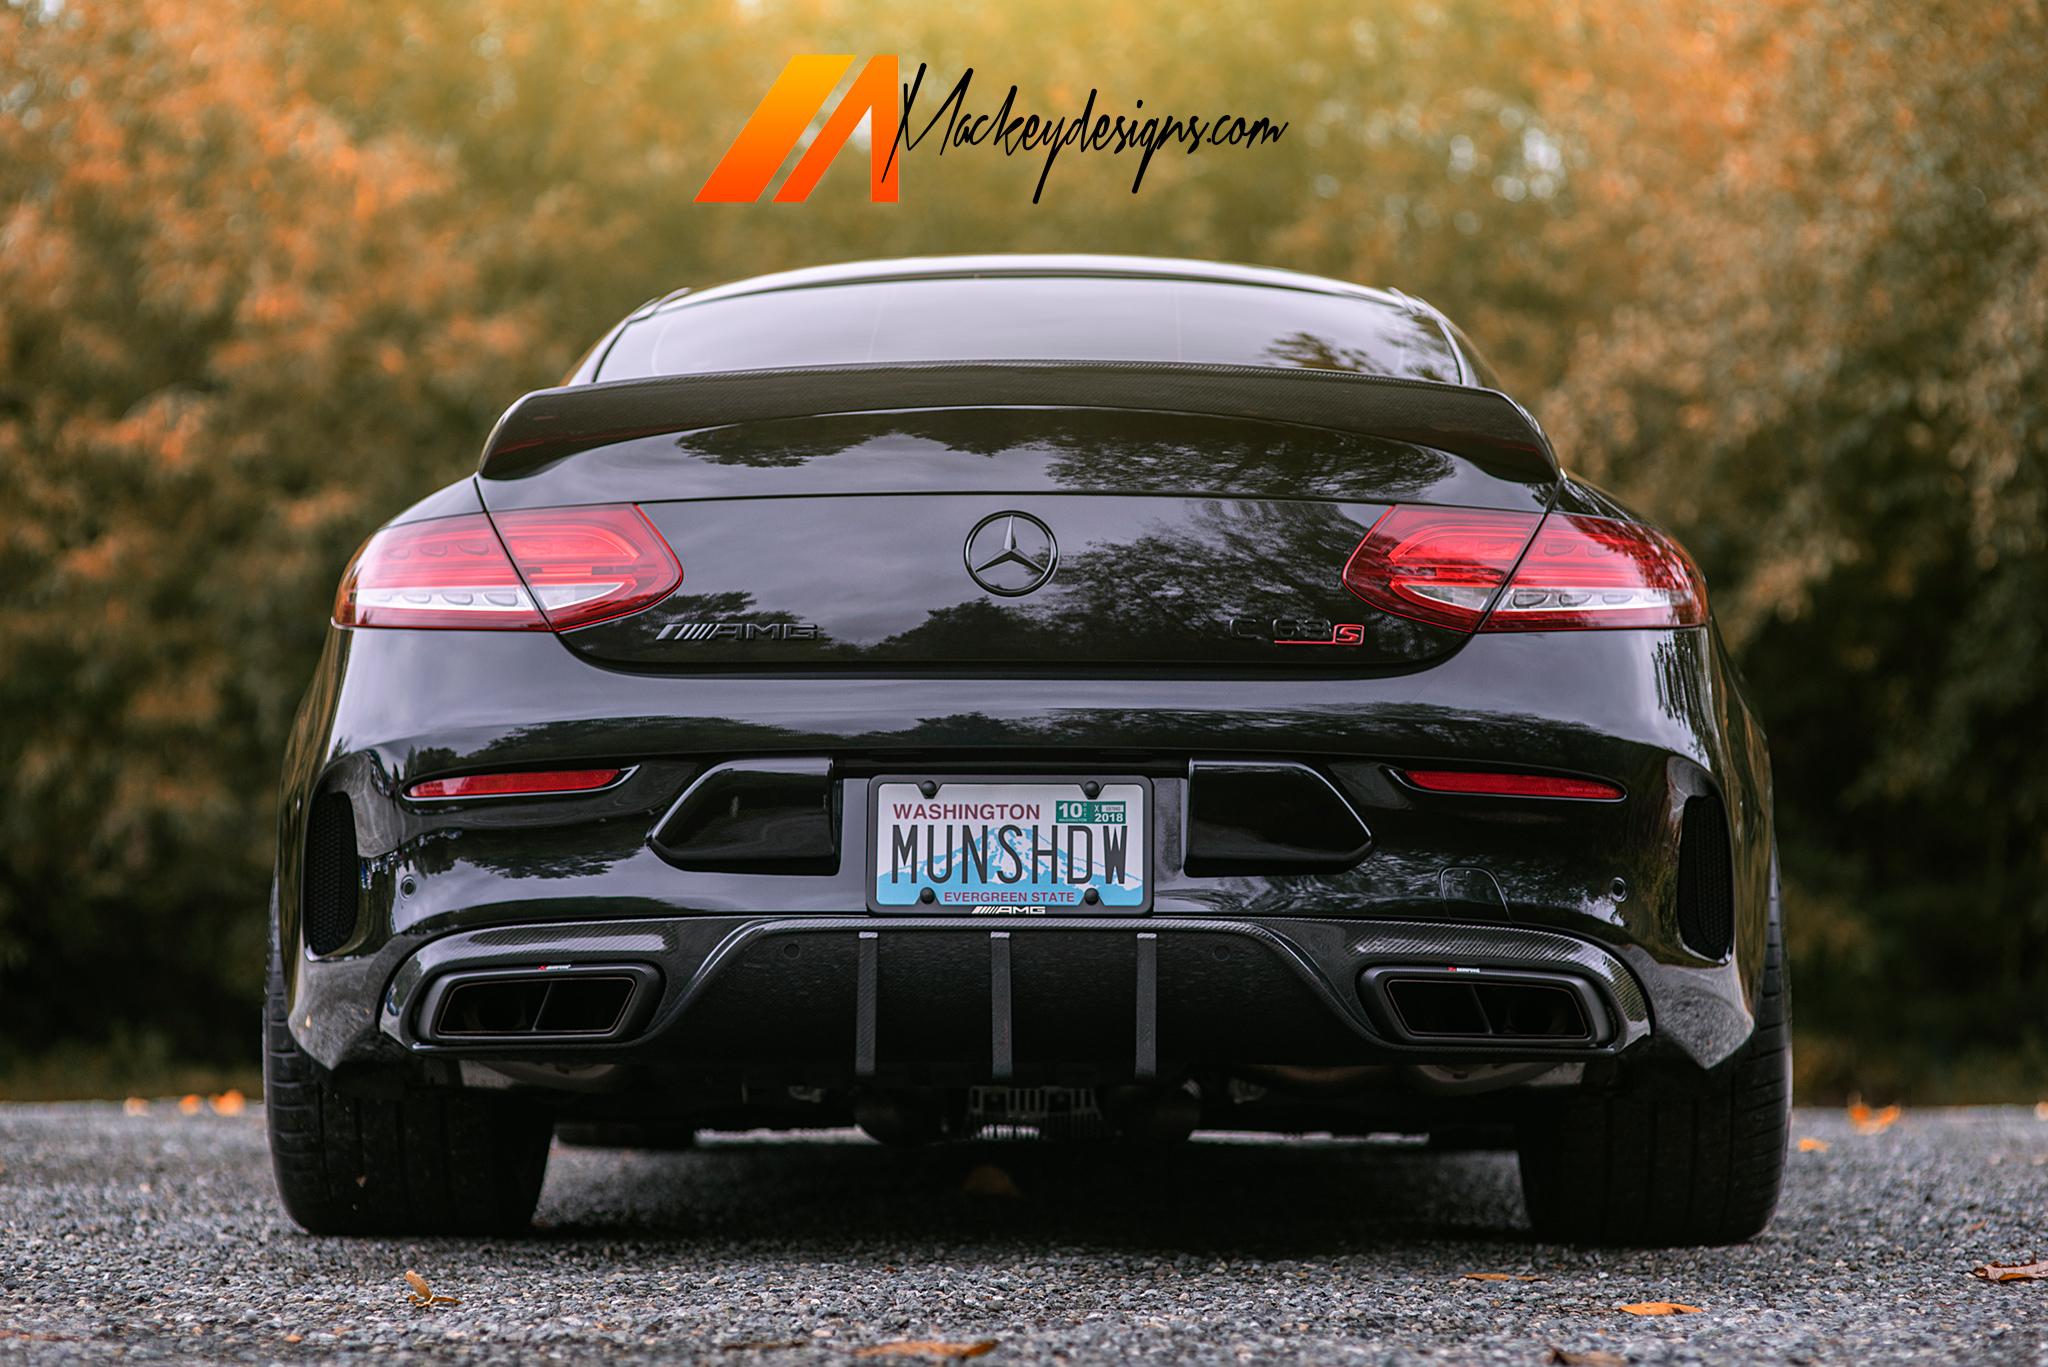 Mackeydesigns_Mercedes_C63S-14.jpg